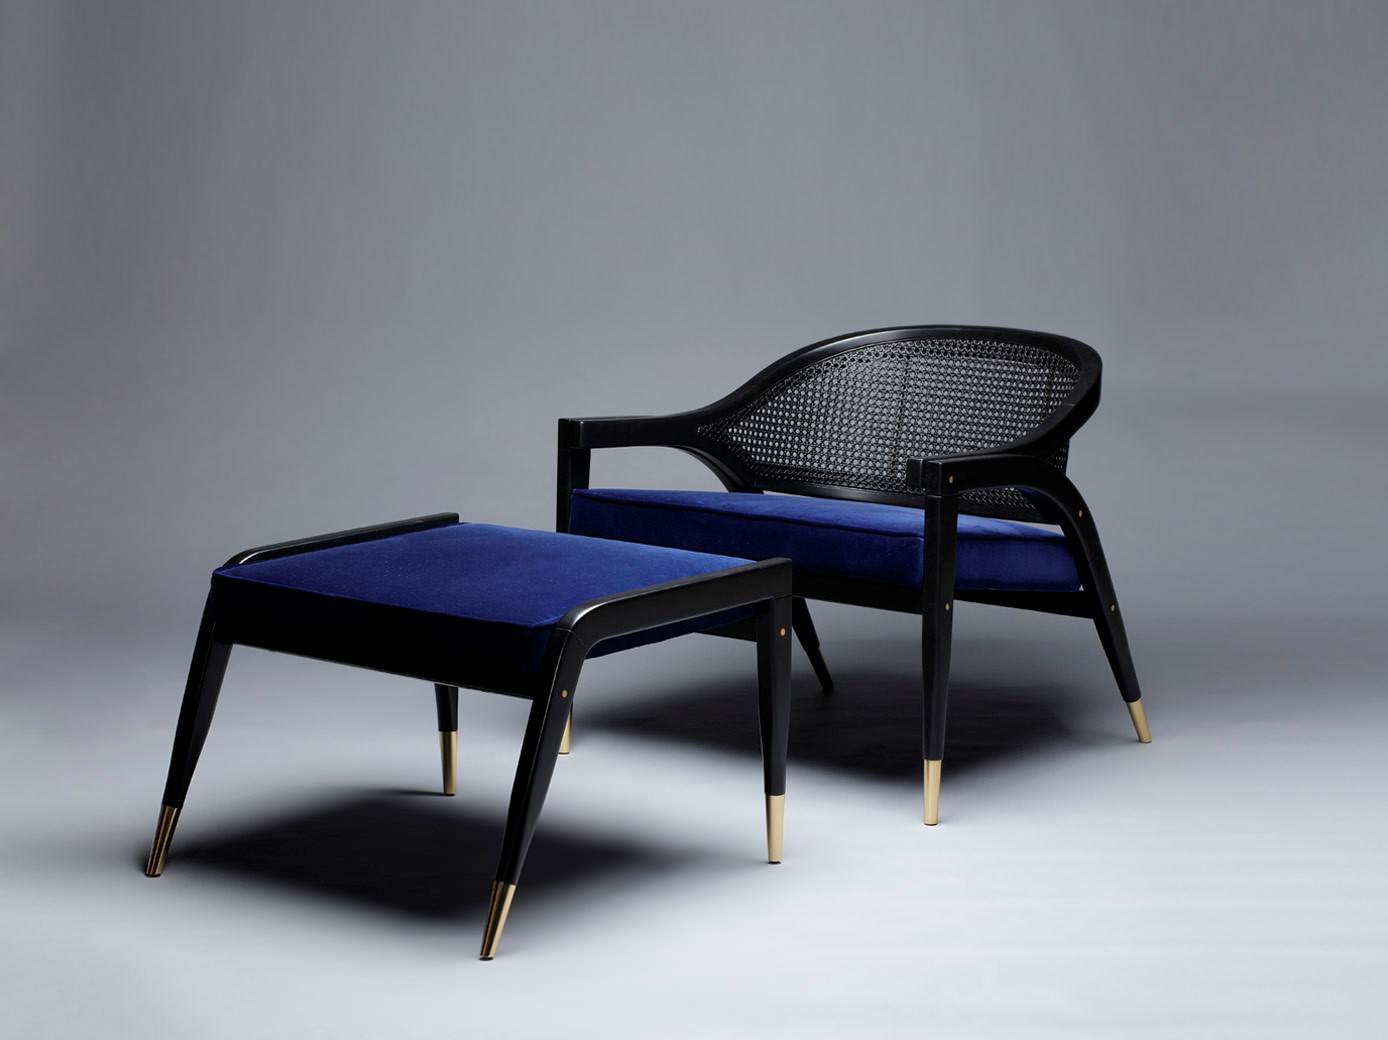 SBID Awards Sponsor Kassavello image of armchair and foot stool